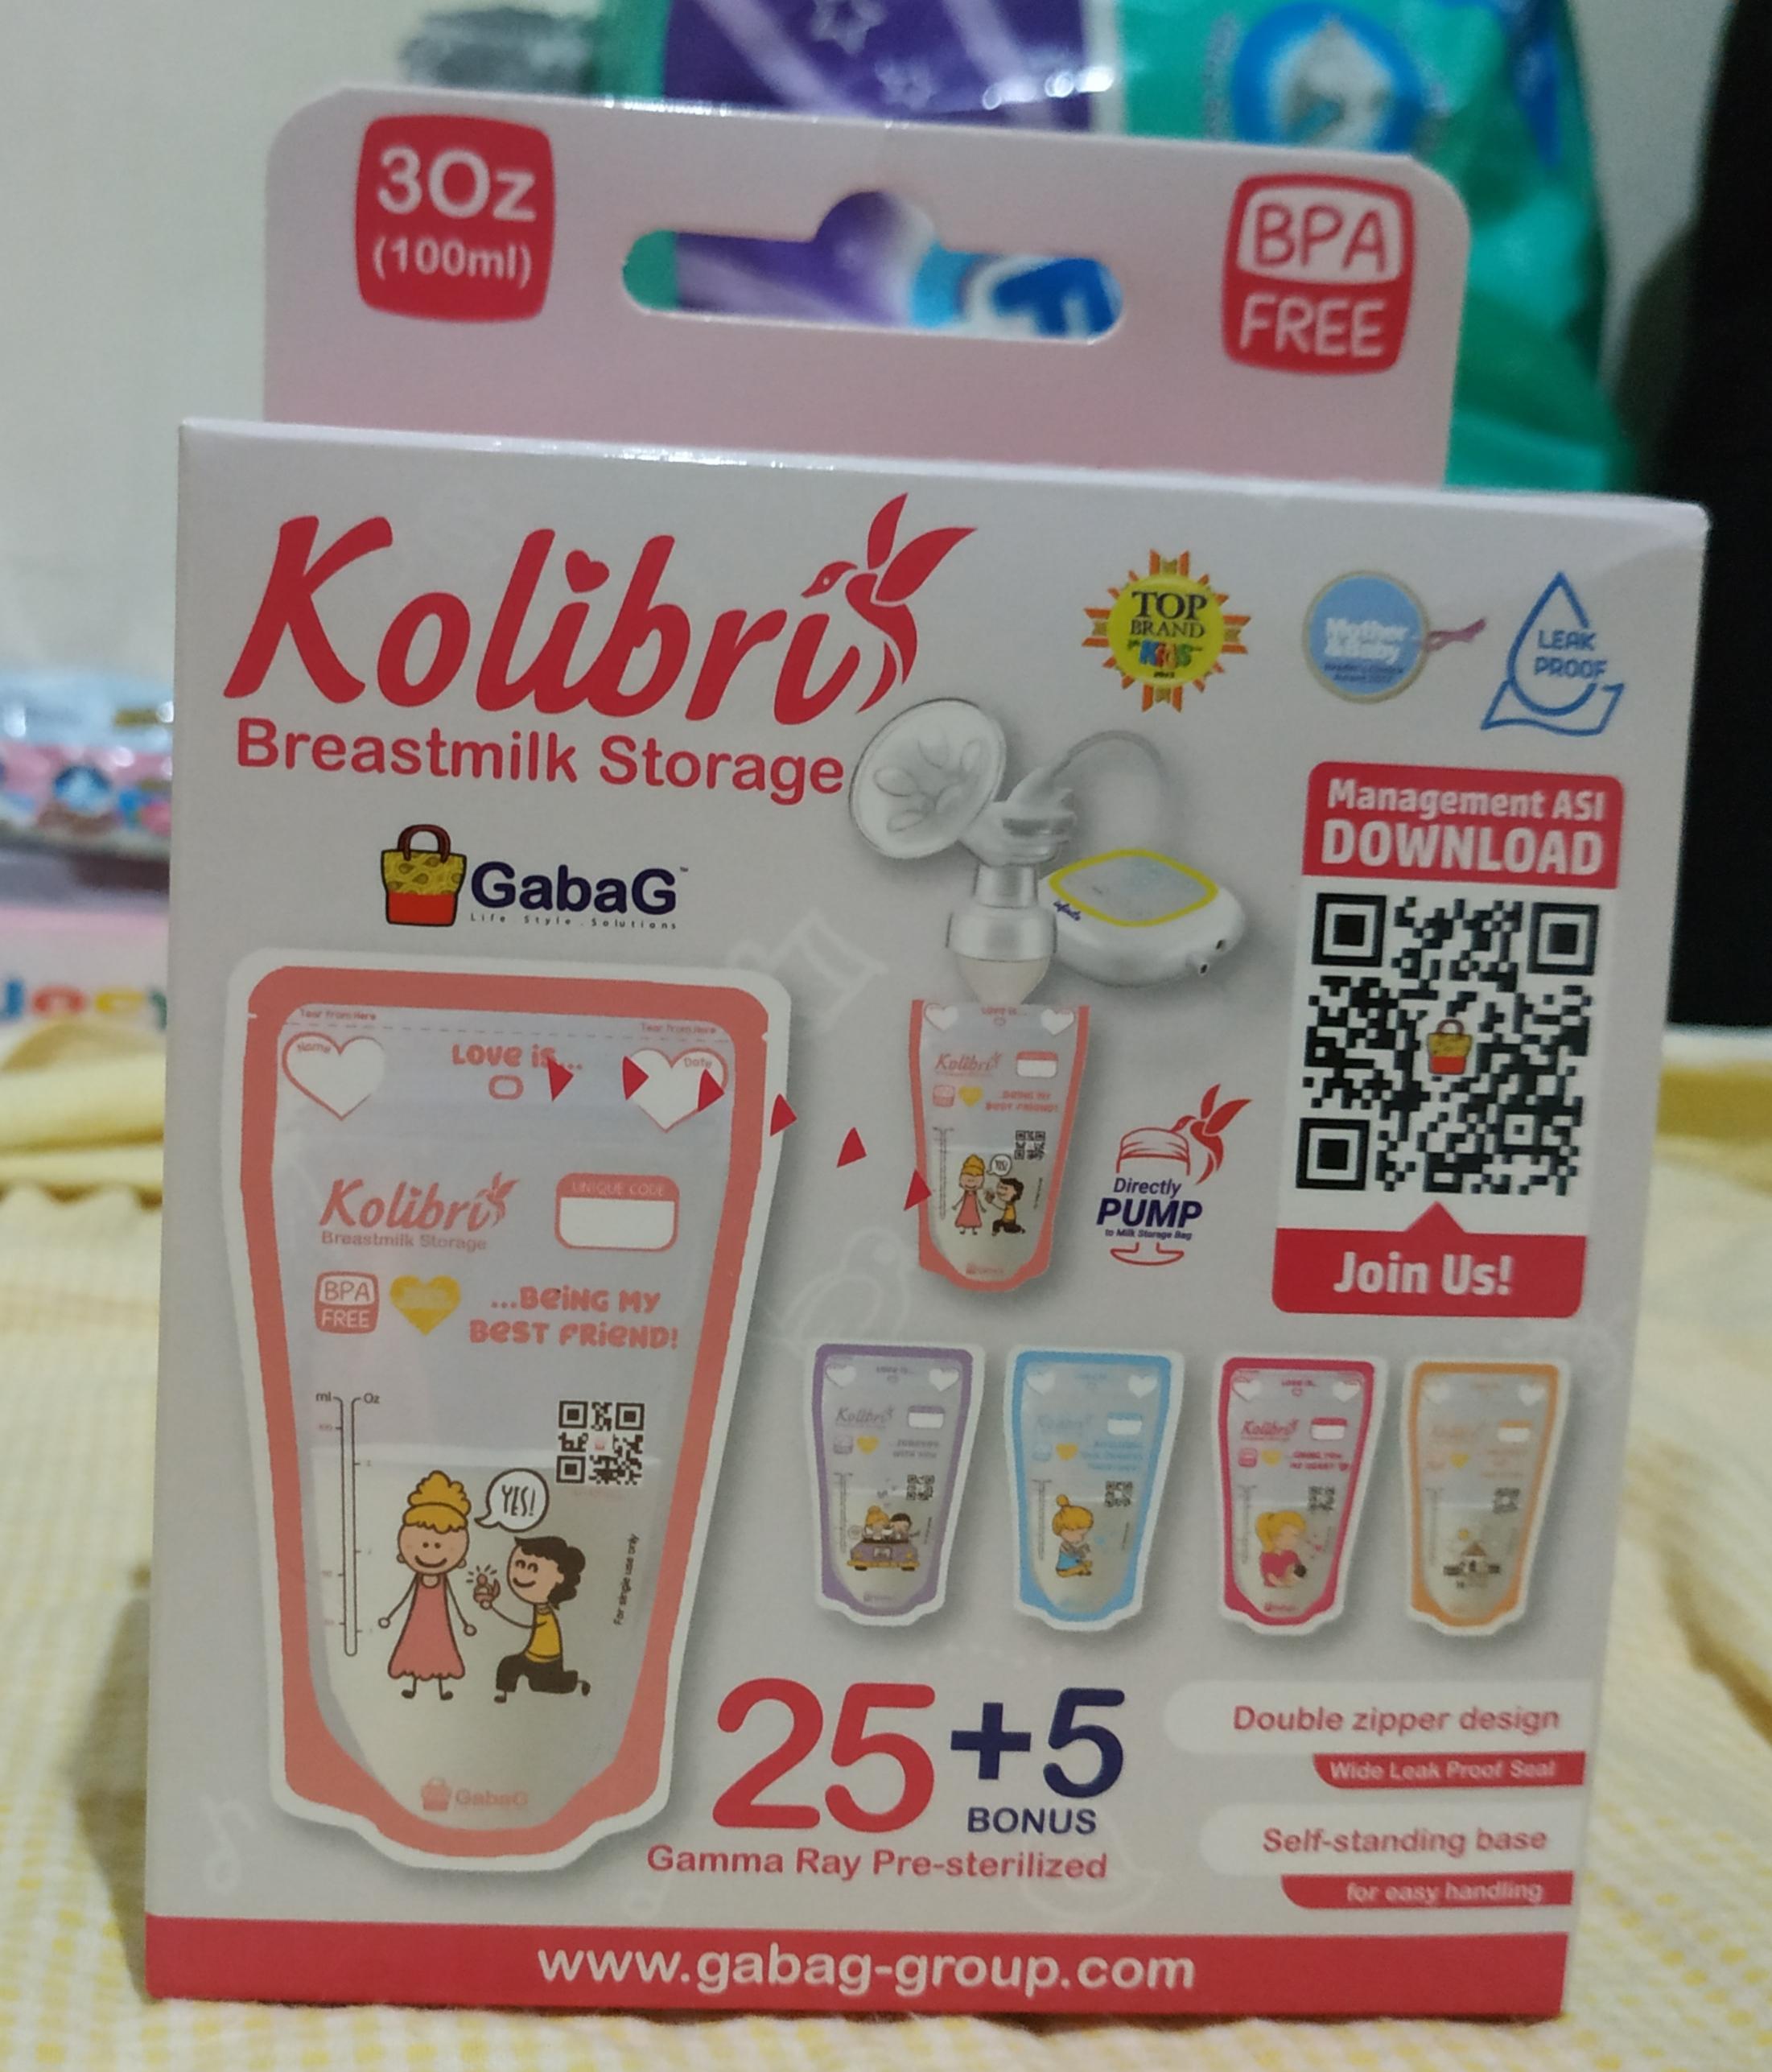 Mother of cat - [Review Product] Breastmilk Storage - Kolibri Gabag 100ml